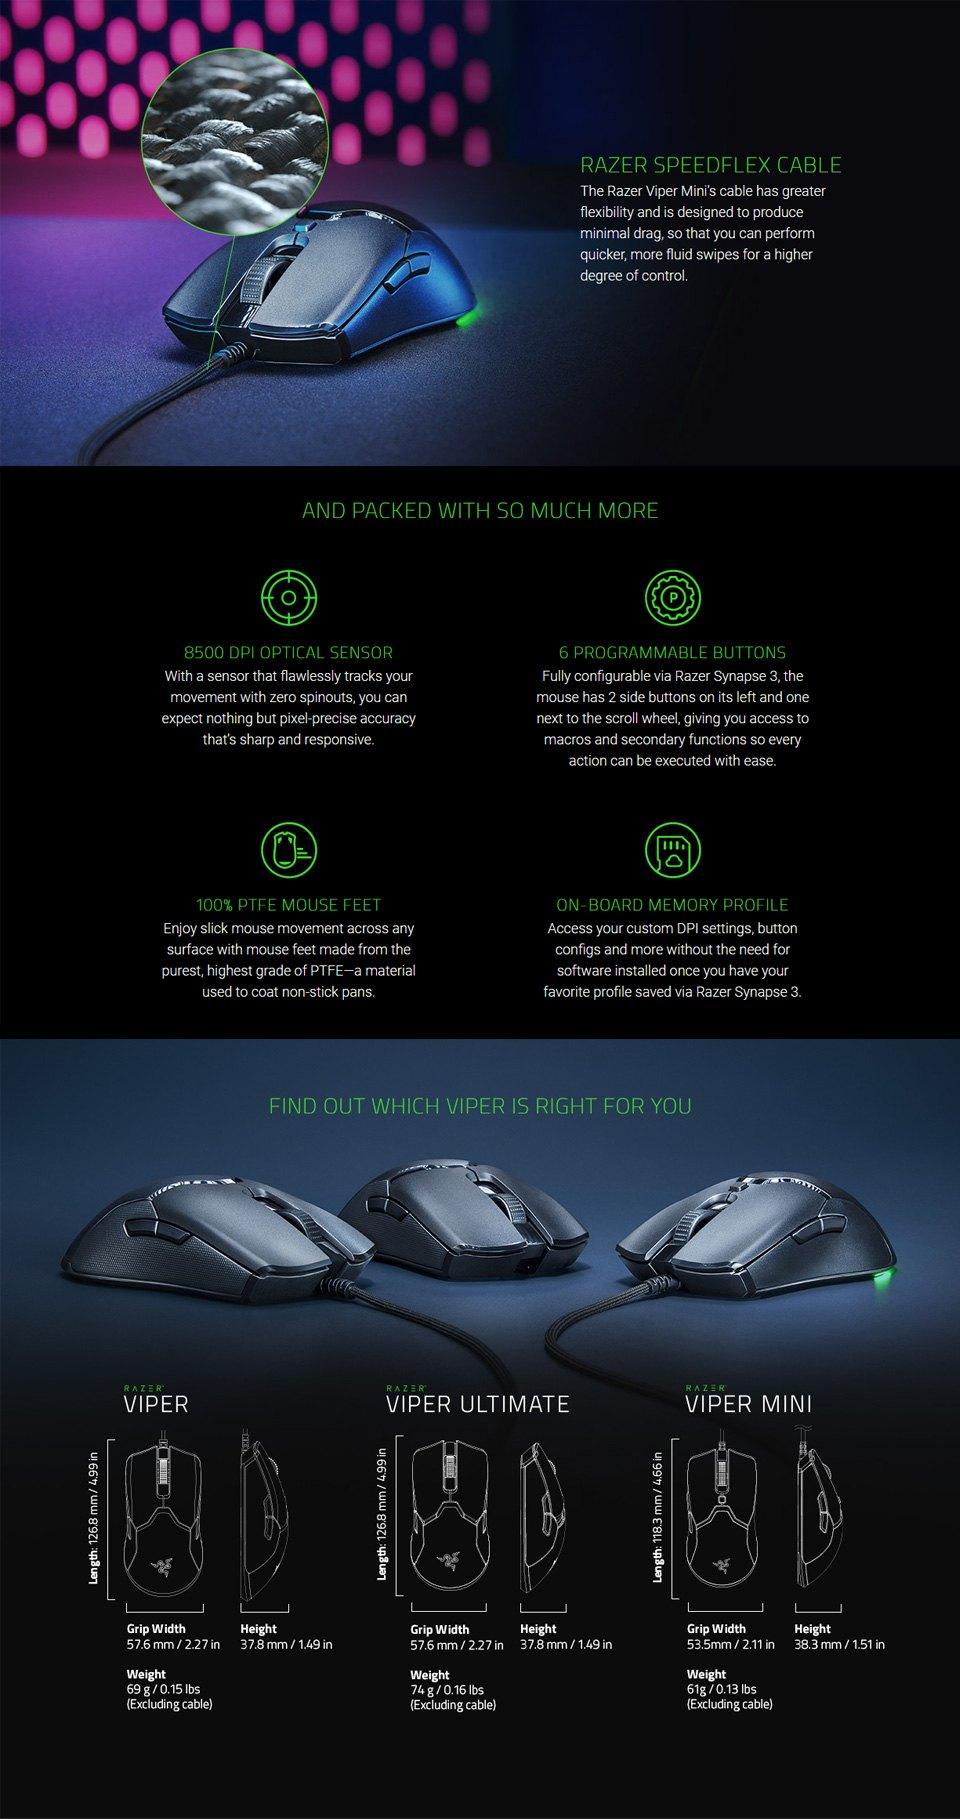 Razer Viper Mini Ultralight Gaming Mouse features 2